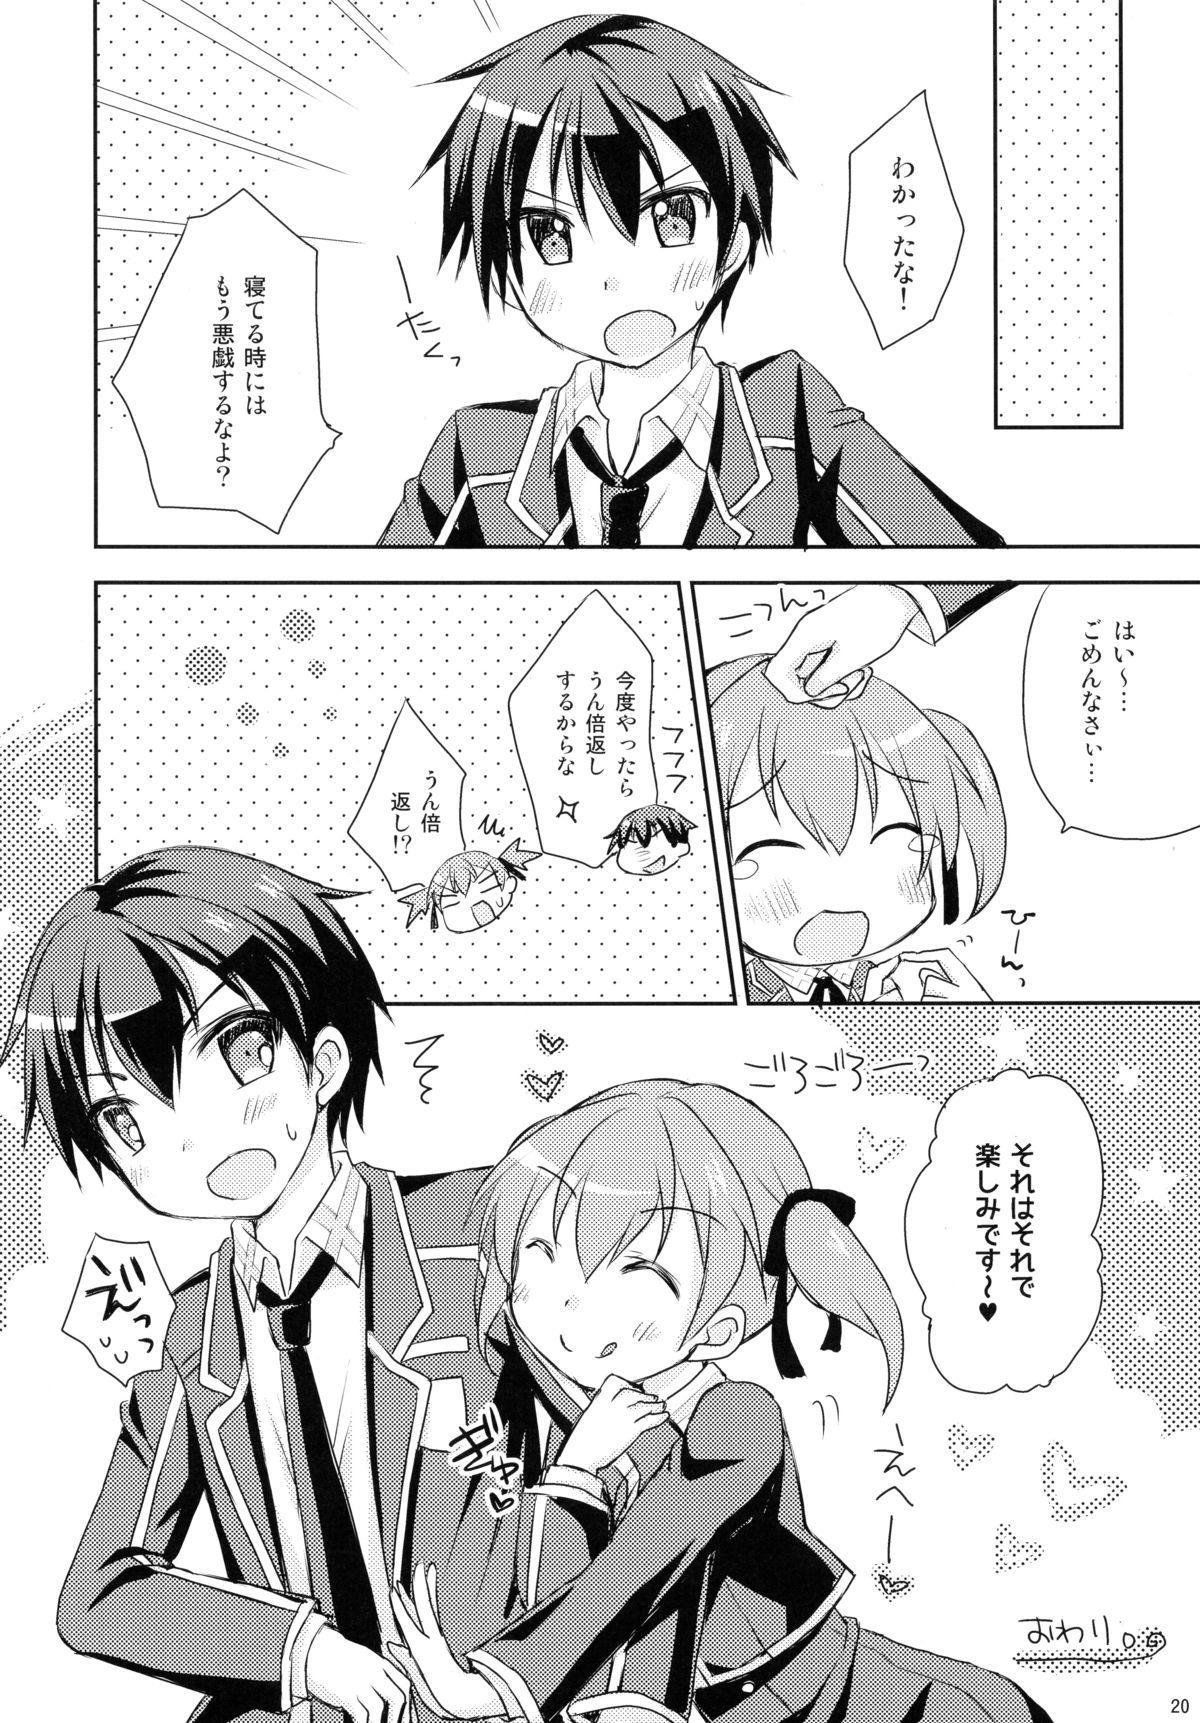 Itazura Silica-chan 19